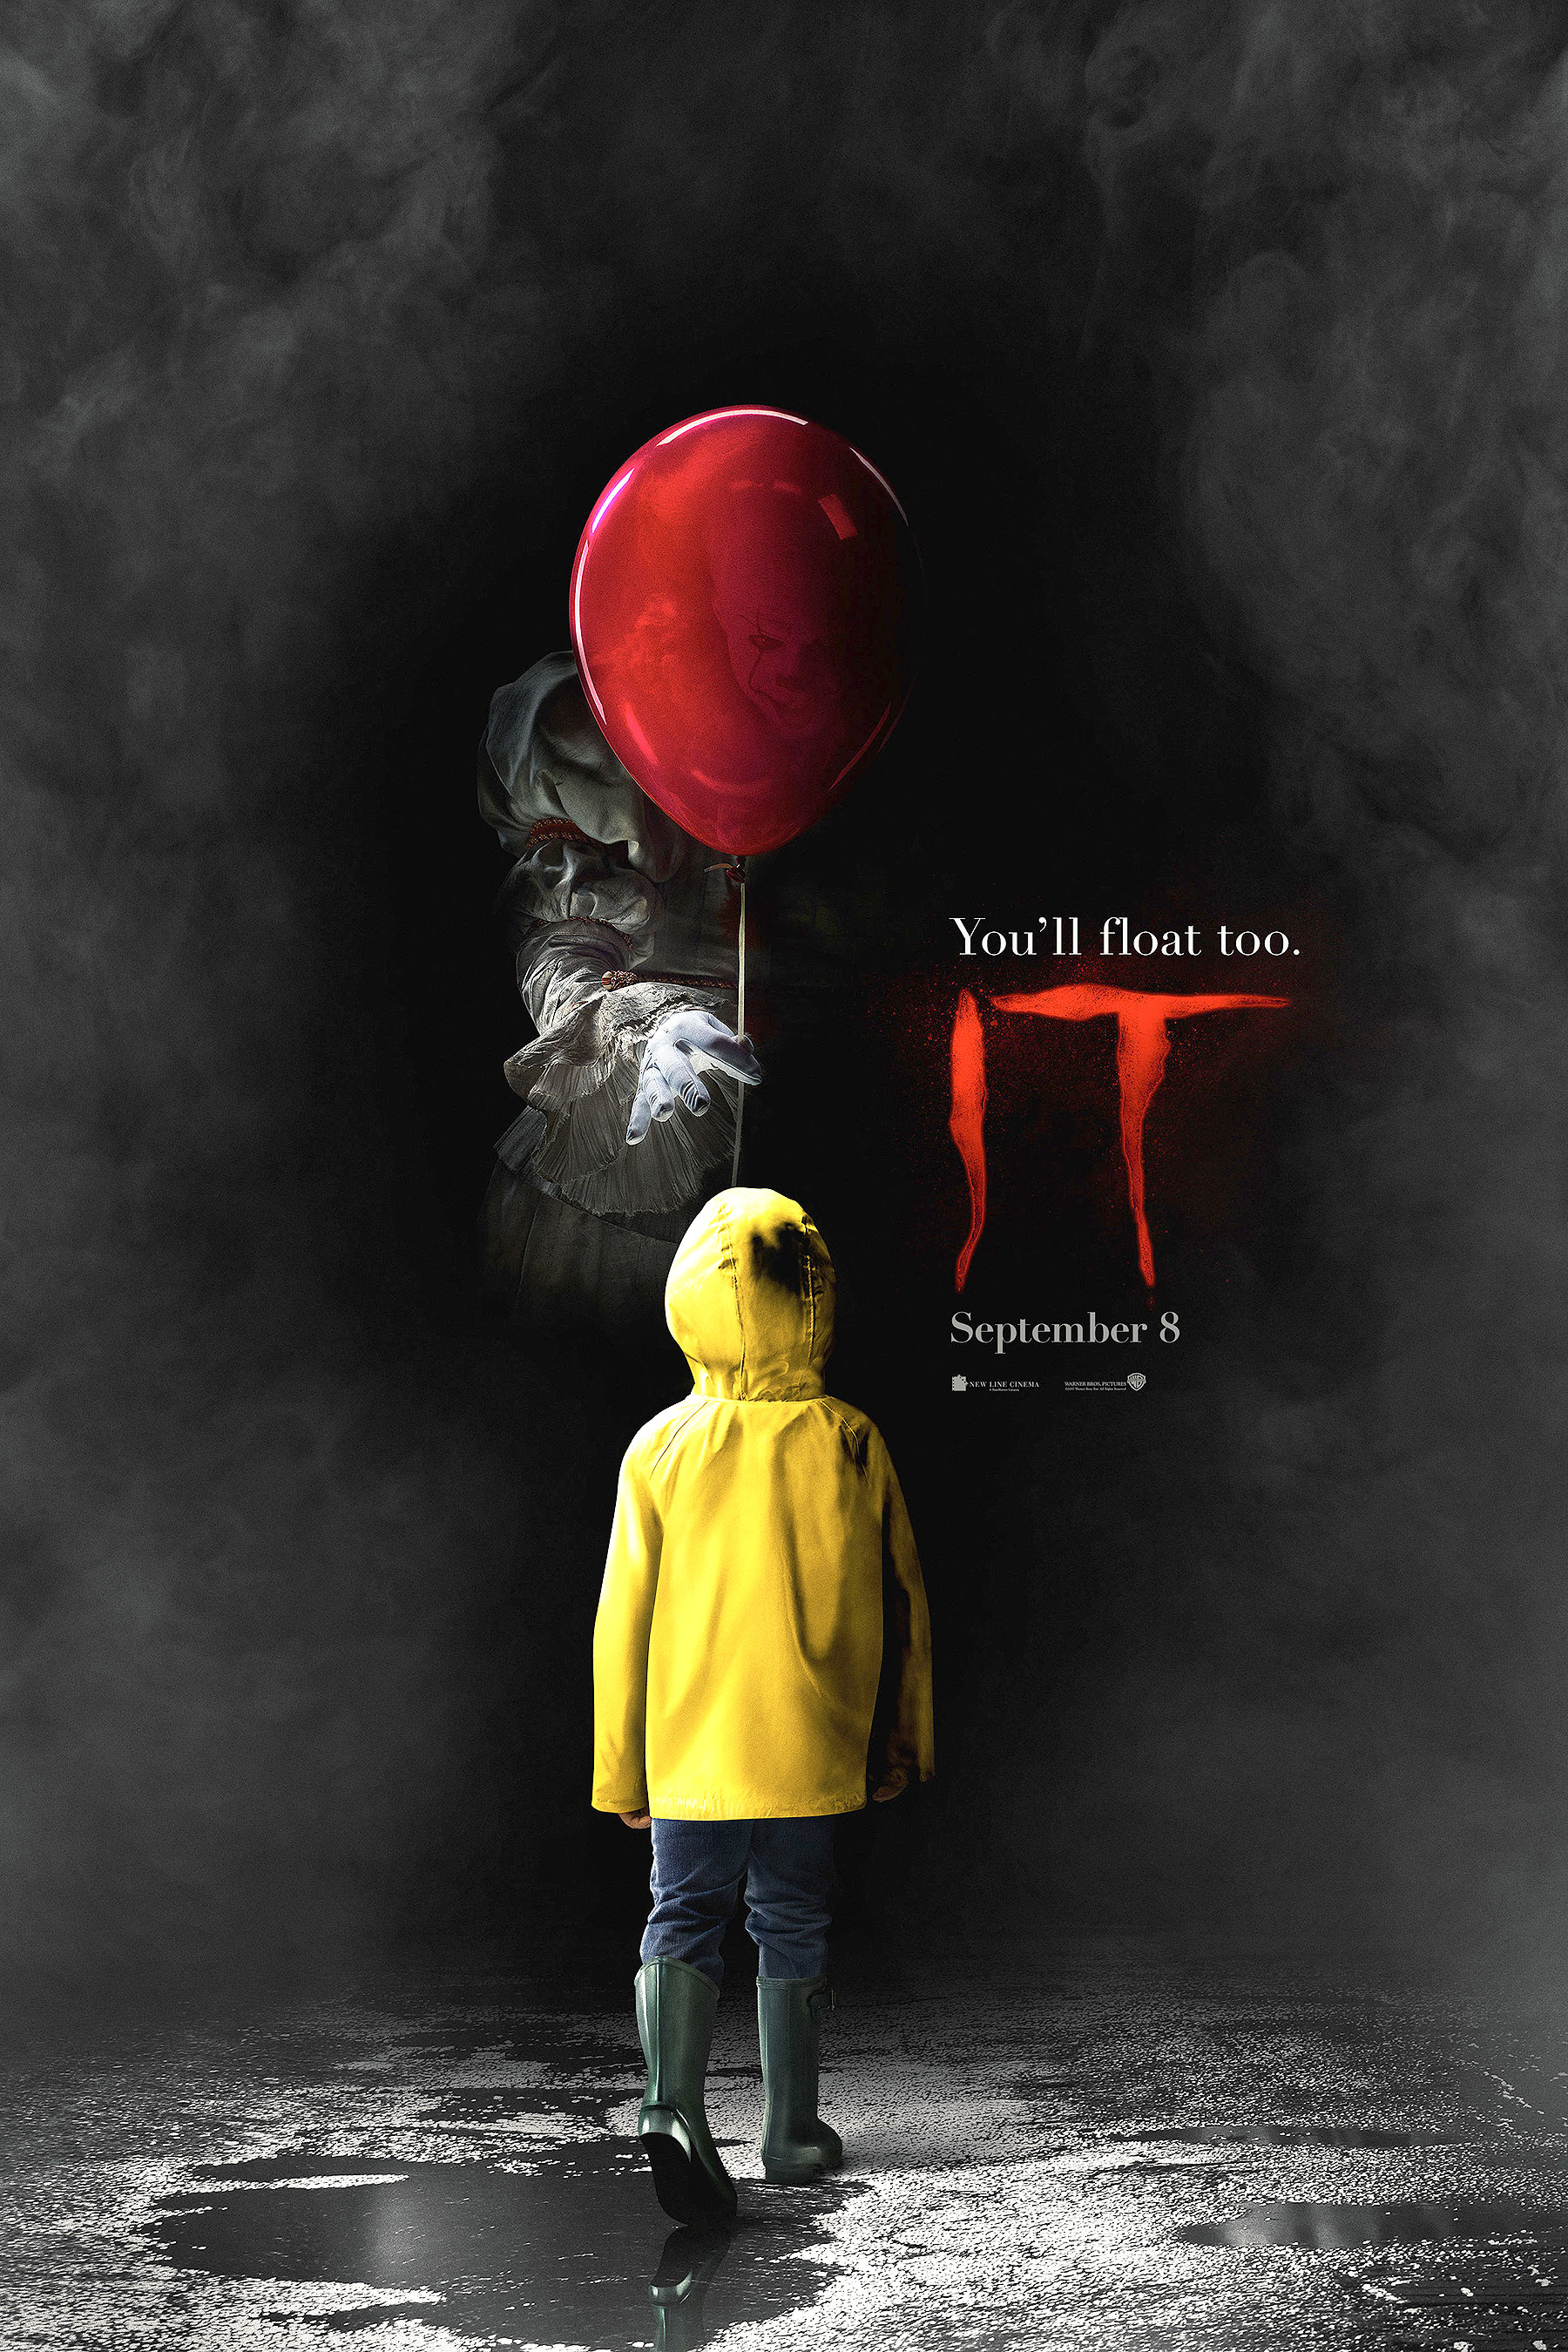 Resultado de imagem para It 2017 posters